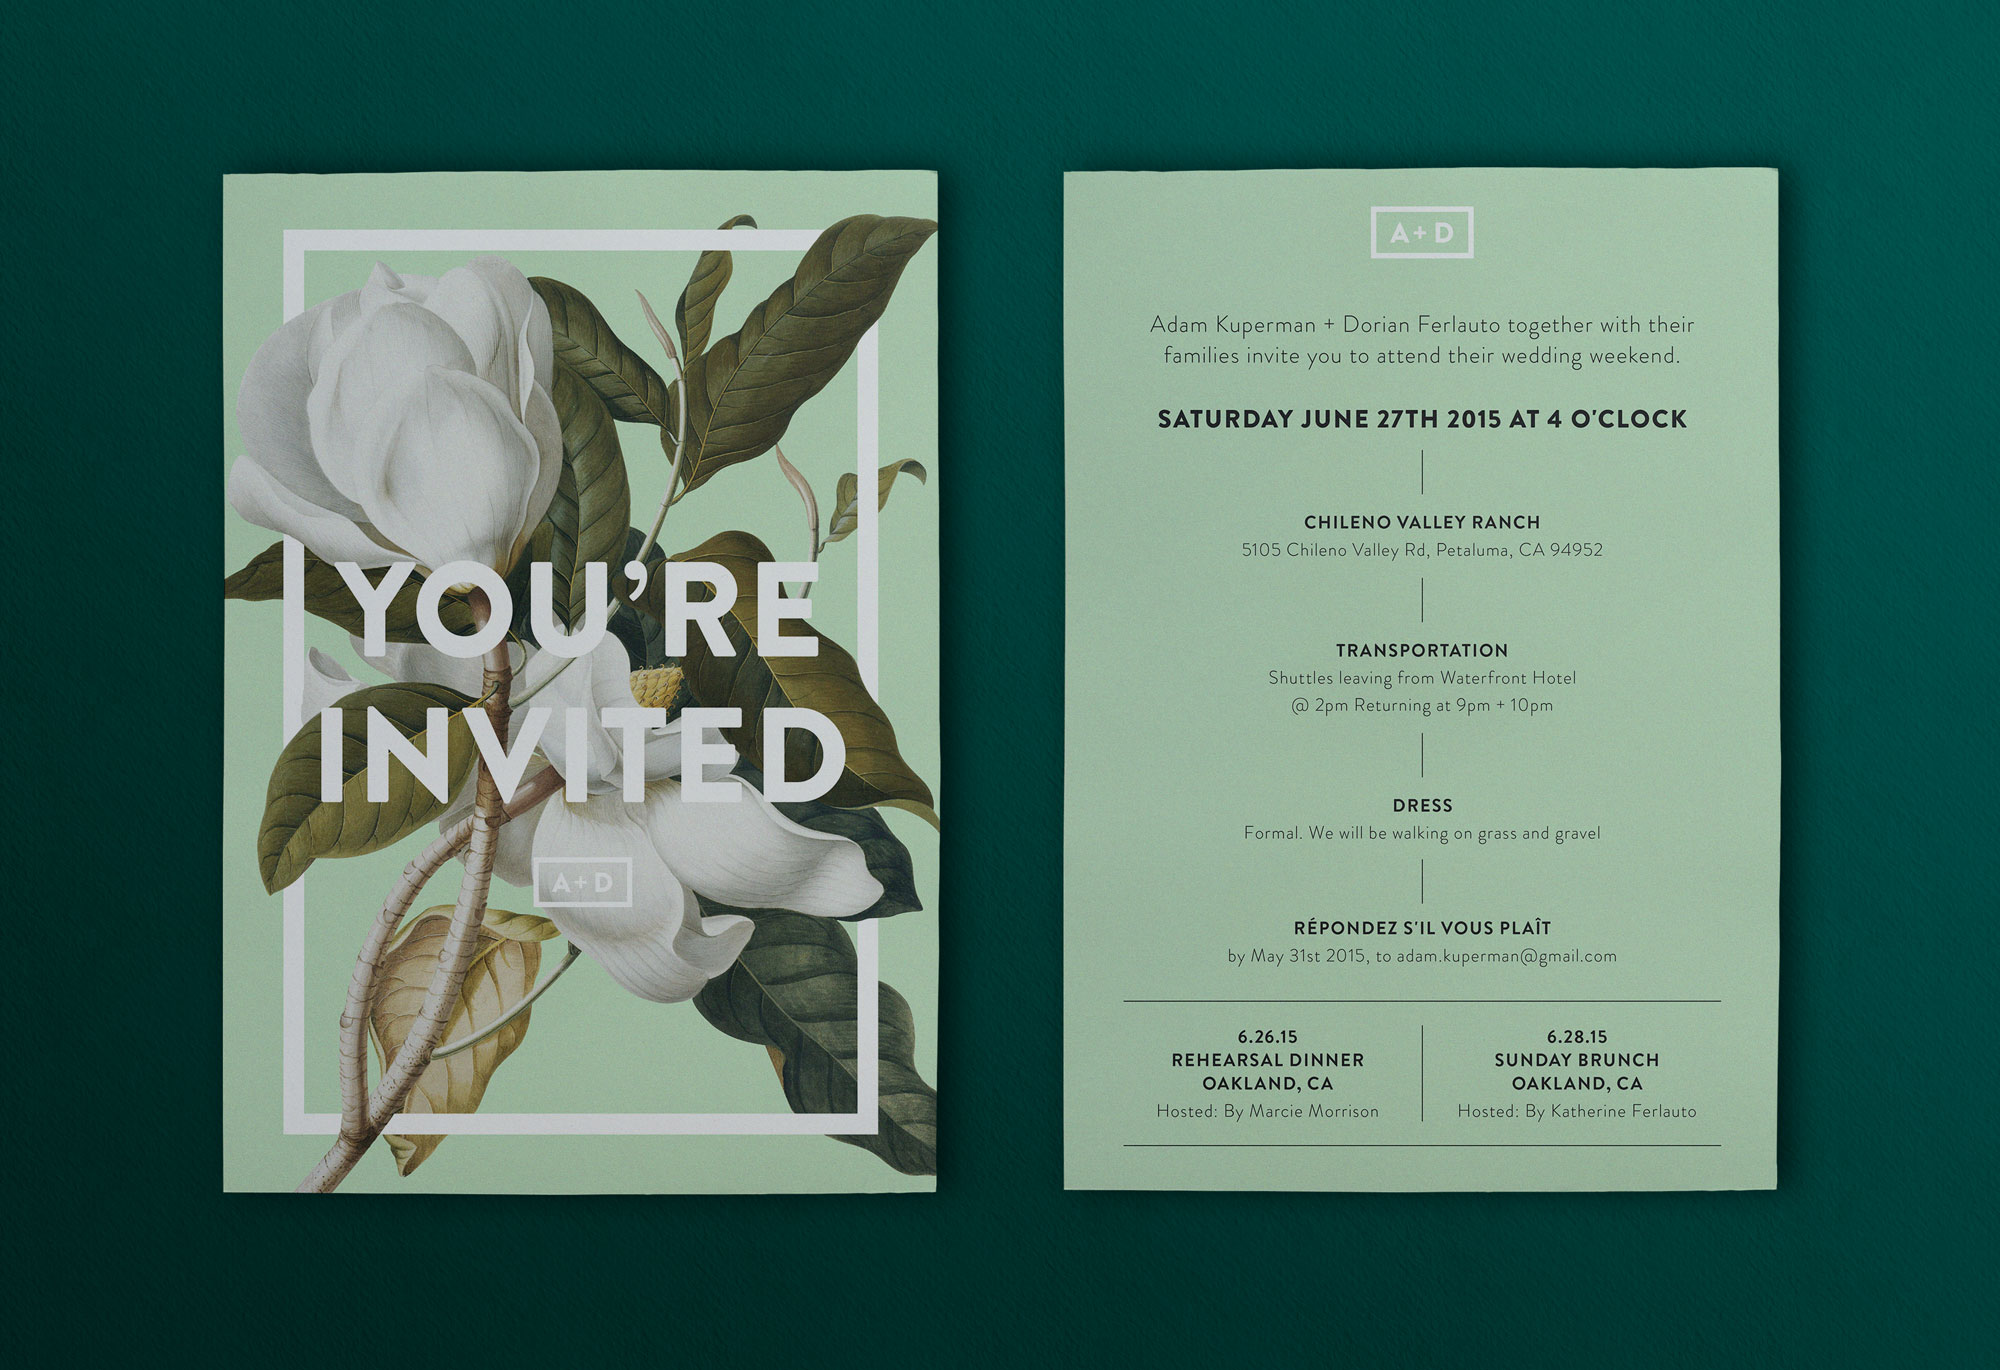 1_AdamAndDorian_Wedding_Invite_Invite.jpg